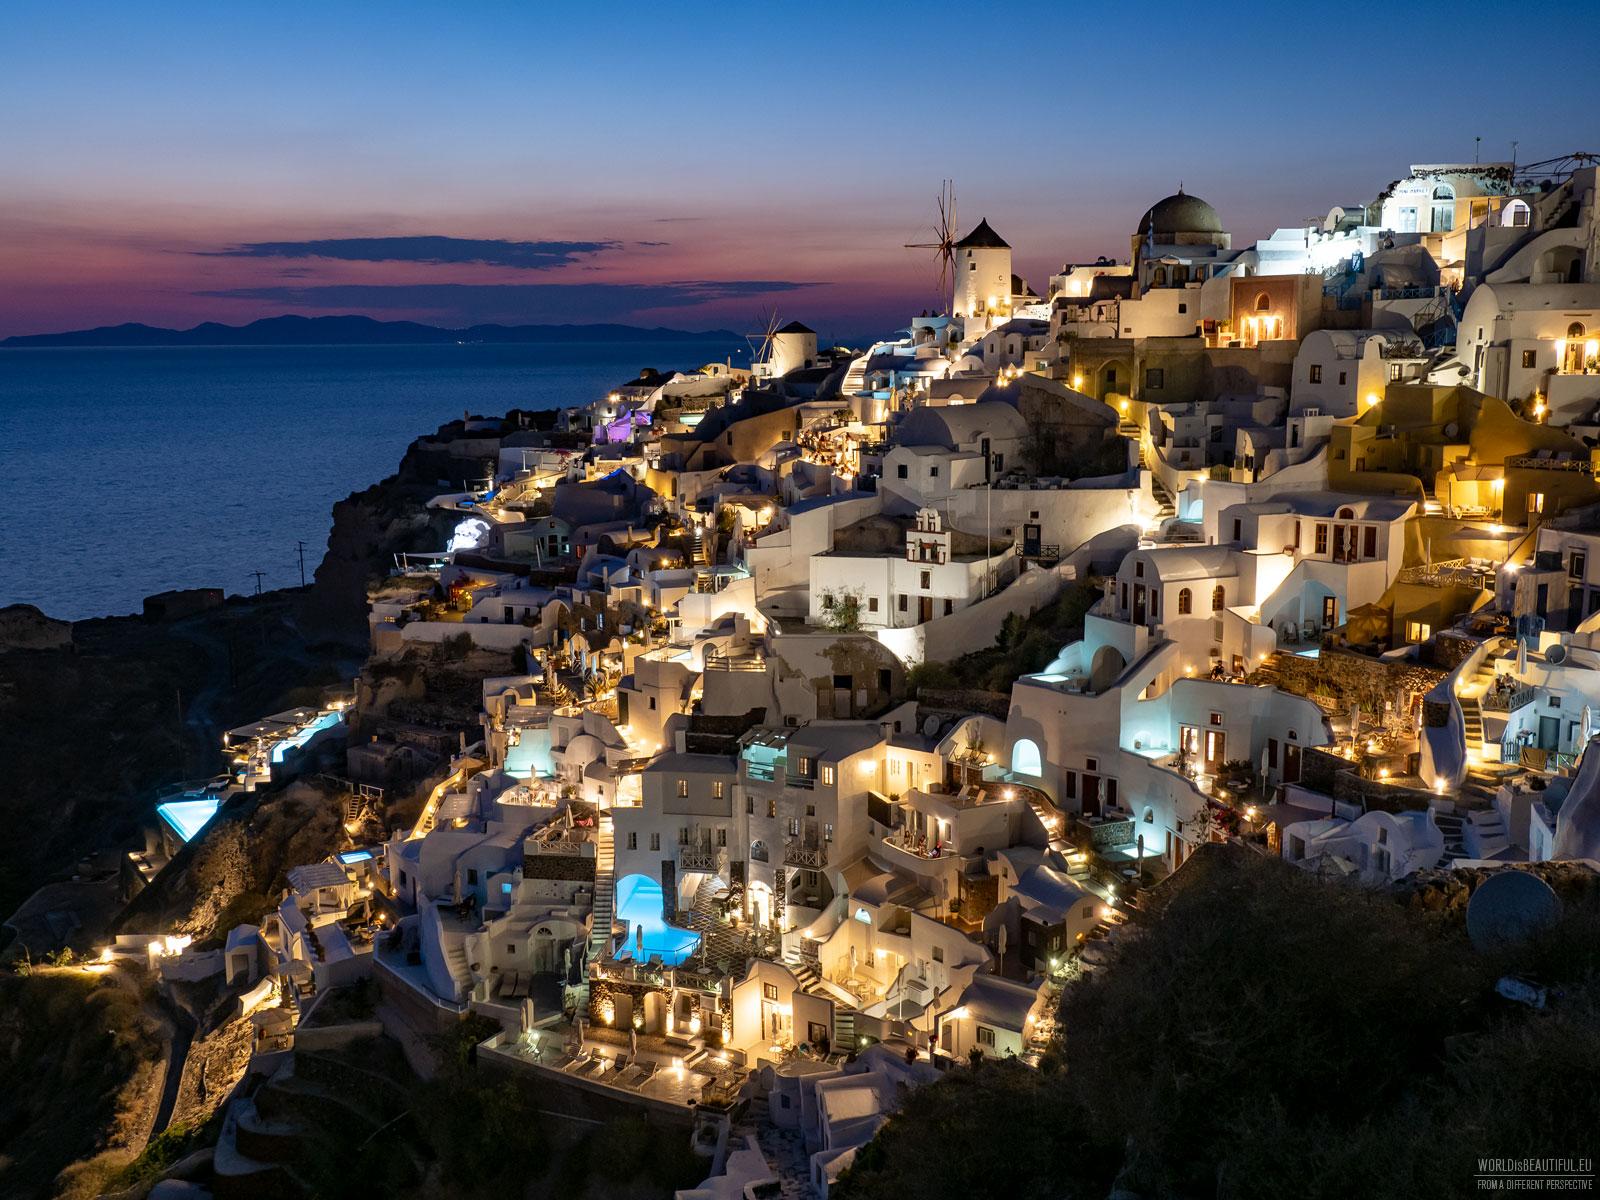 Pictures of Santorini